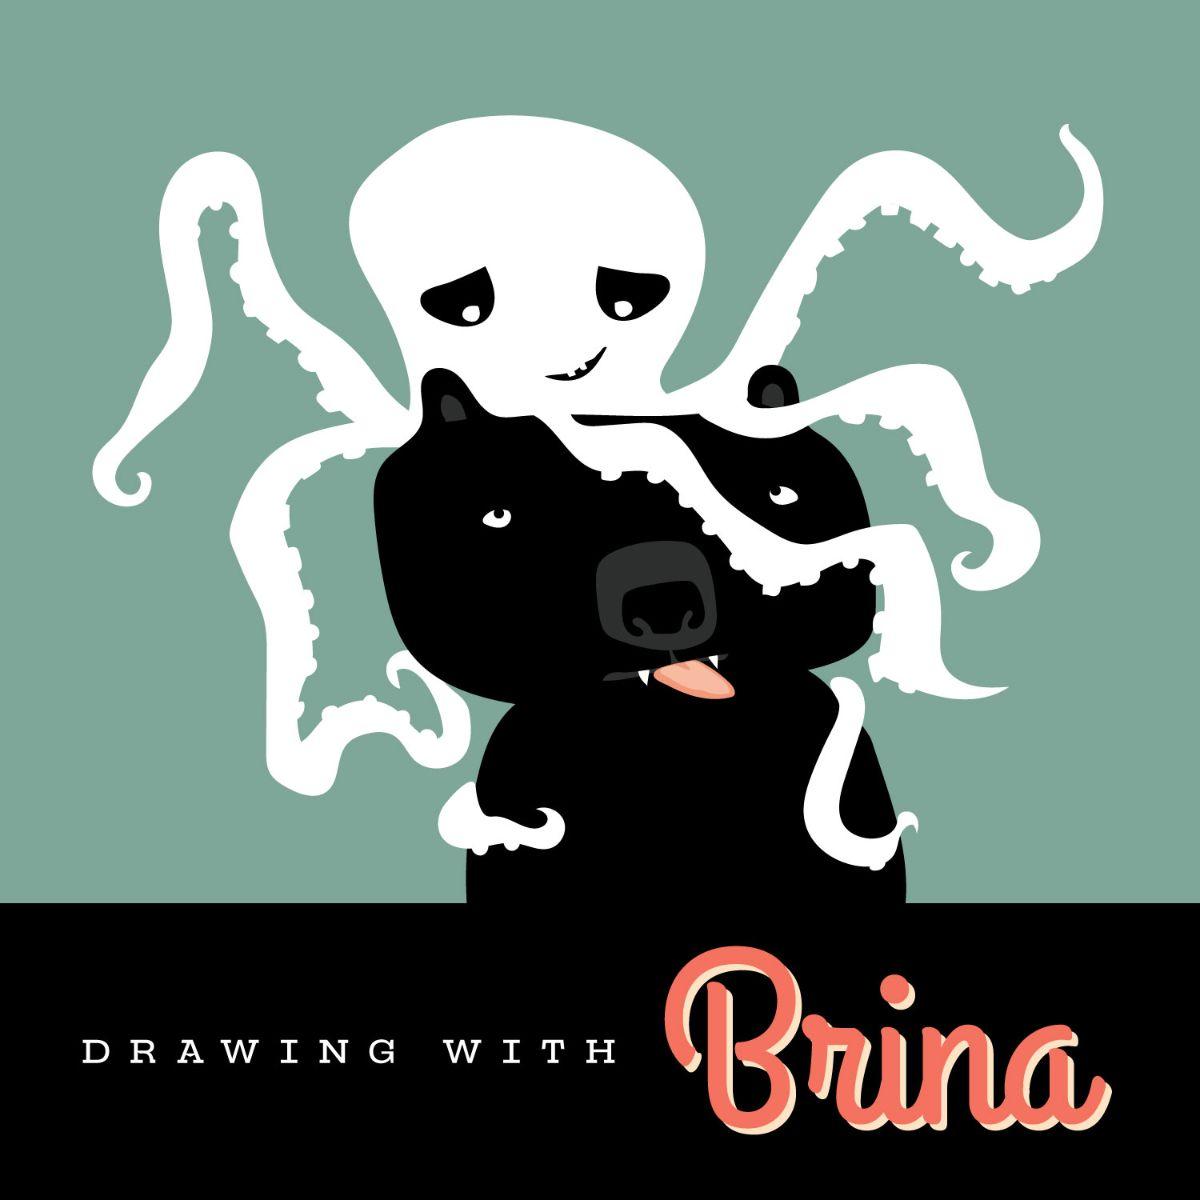 Drawing with Brina